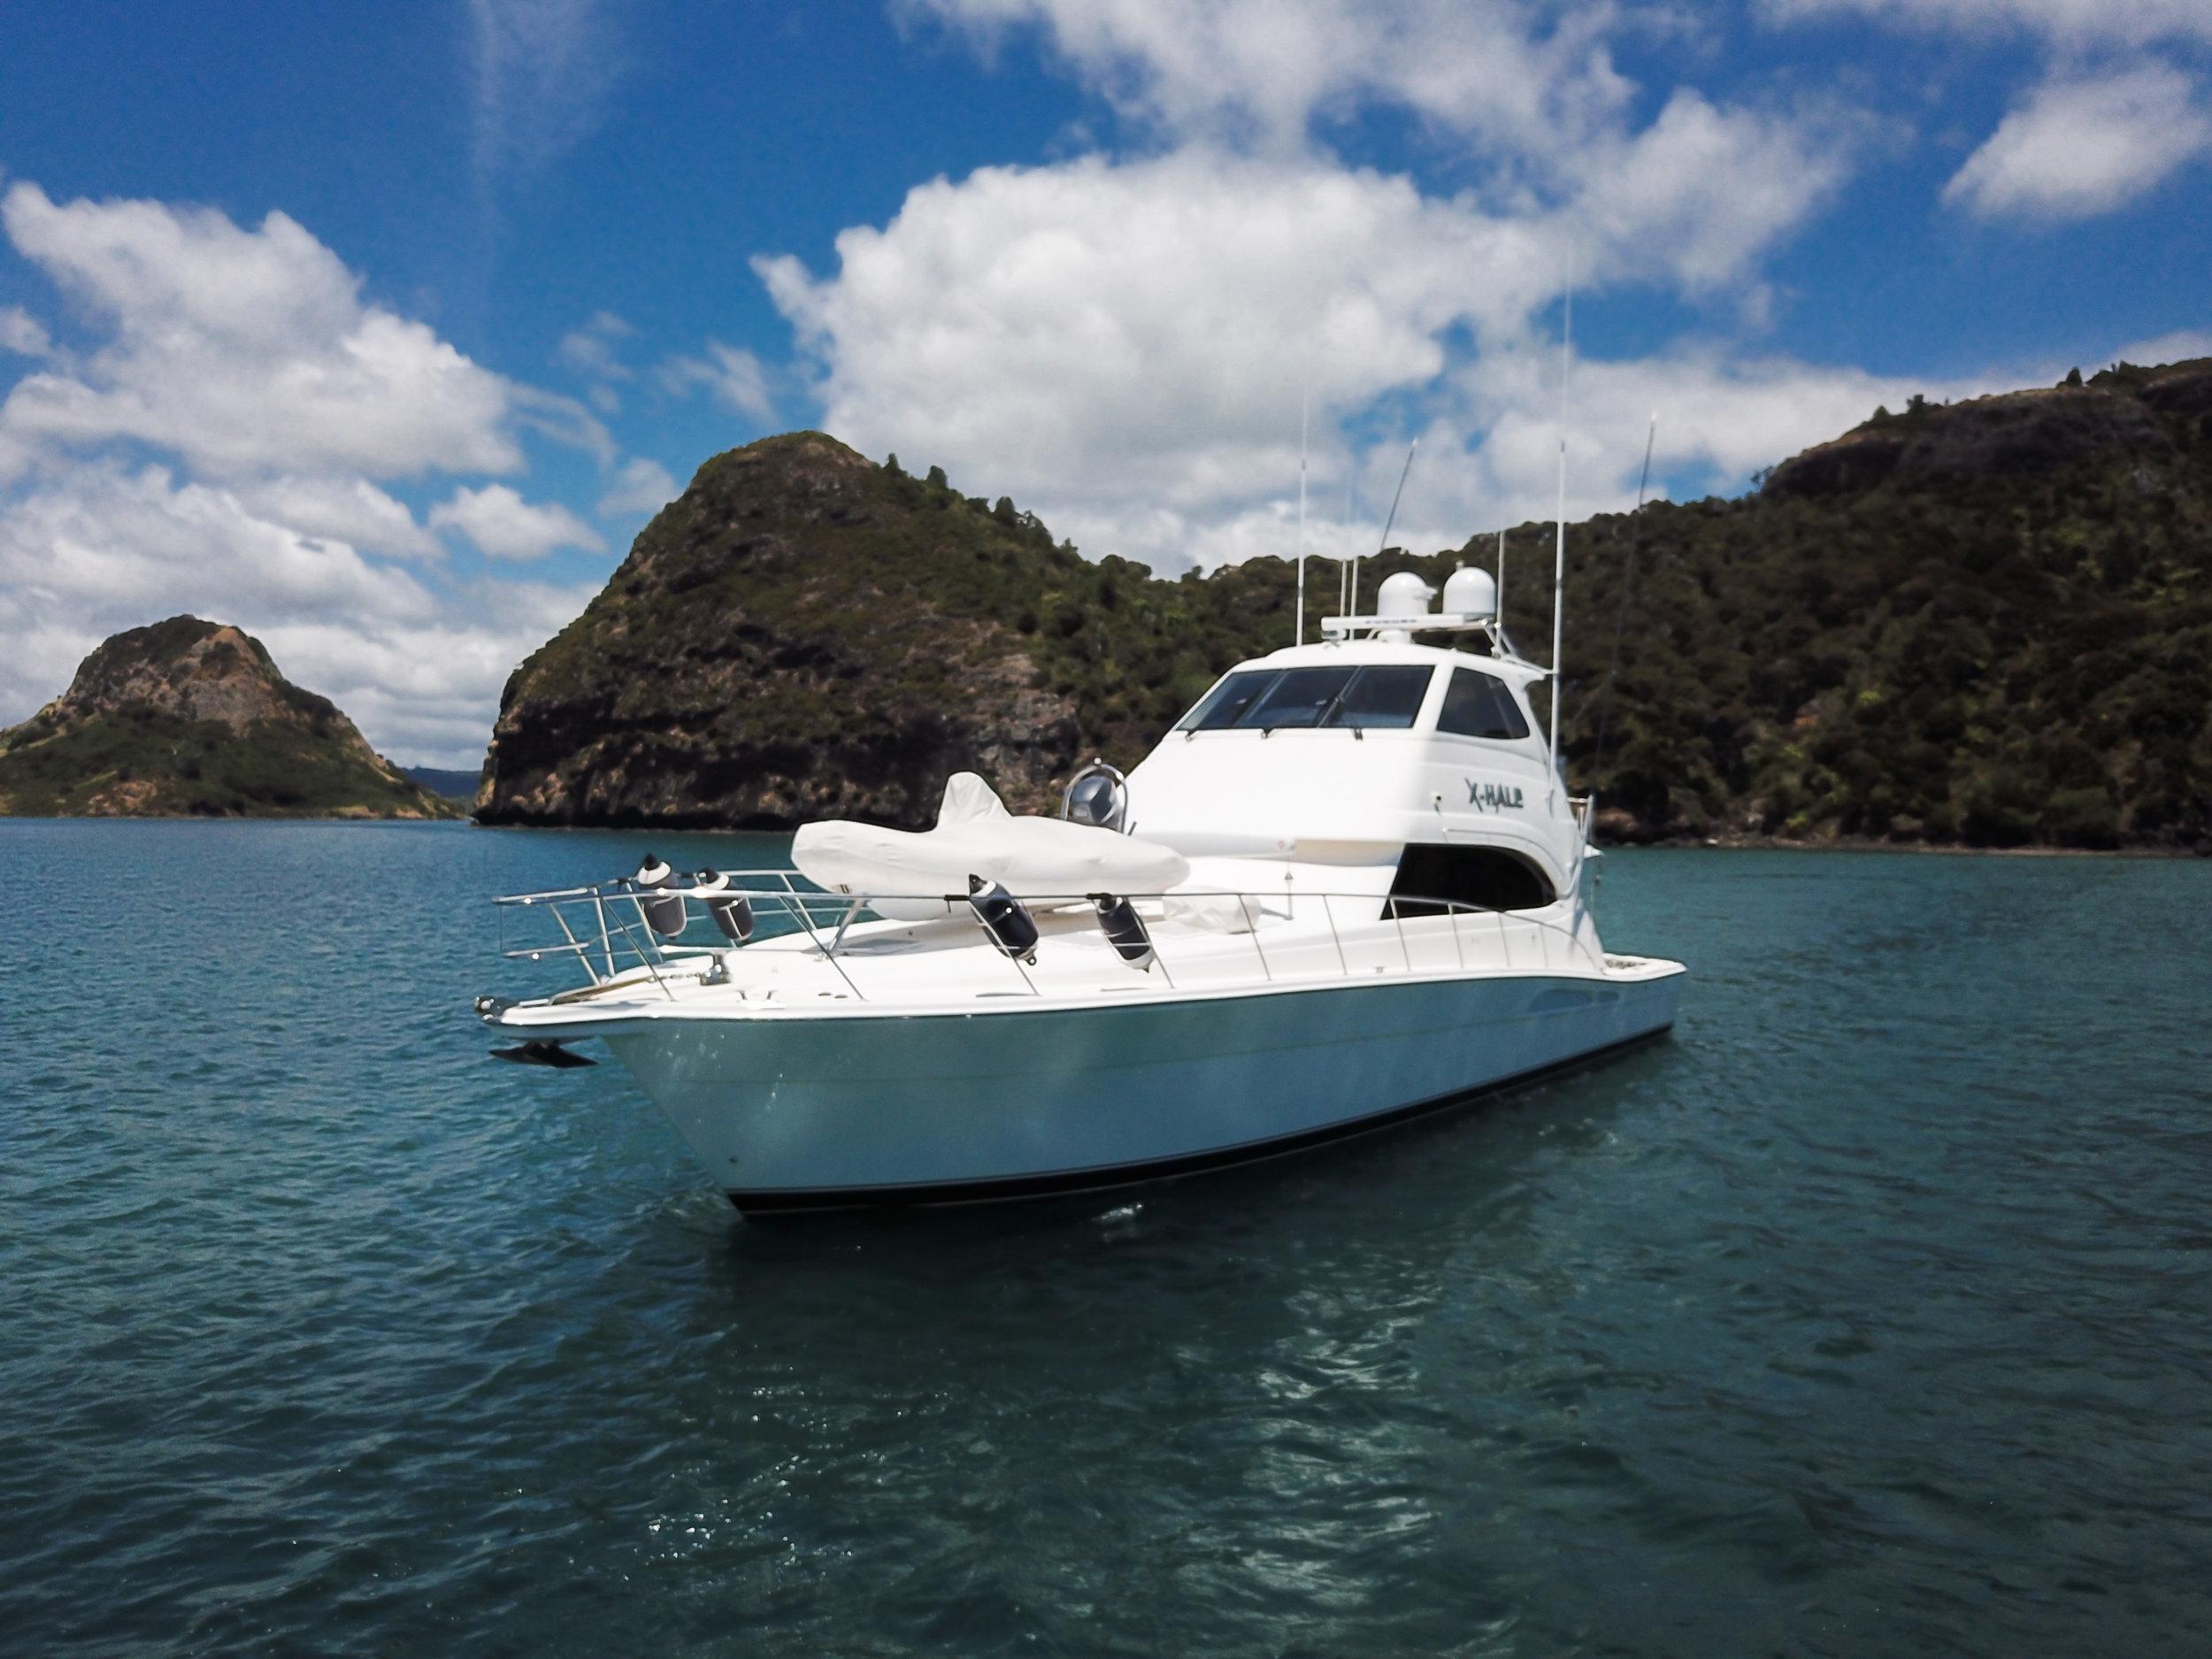 01_Marine Photography NZ.jpg